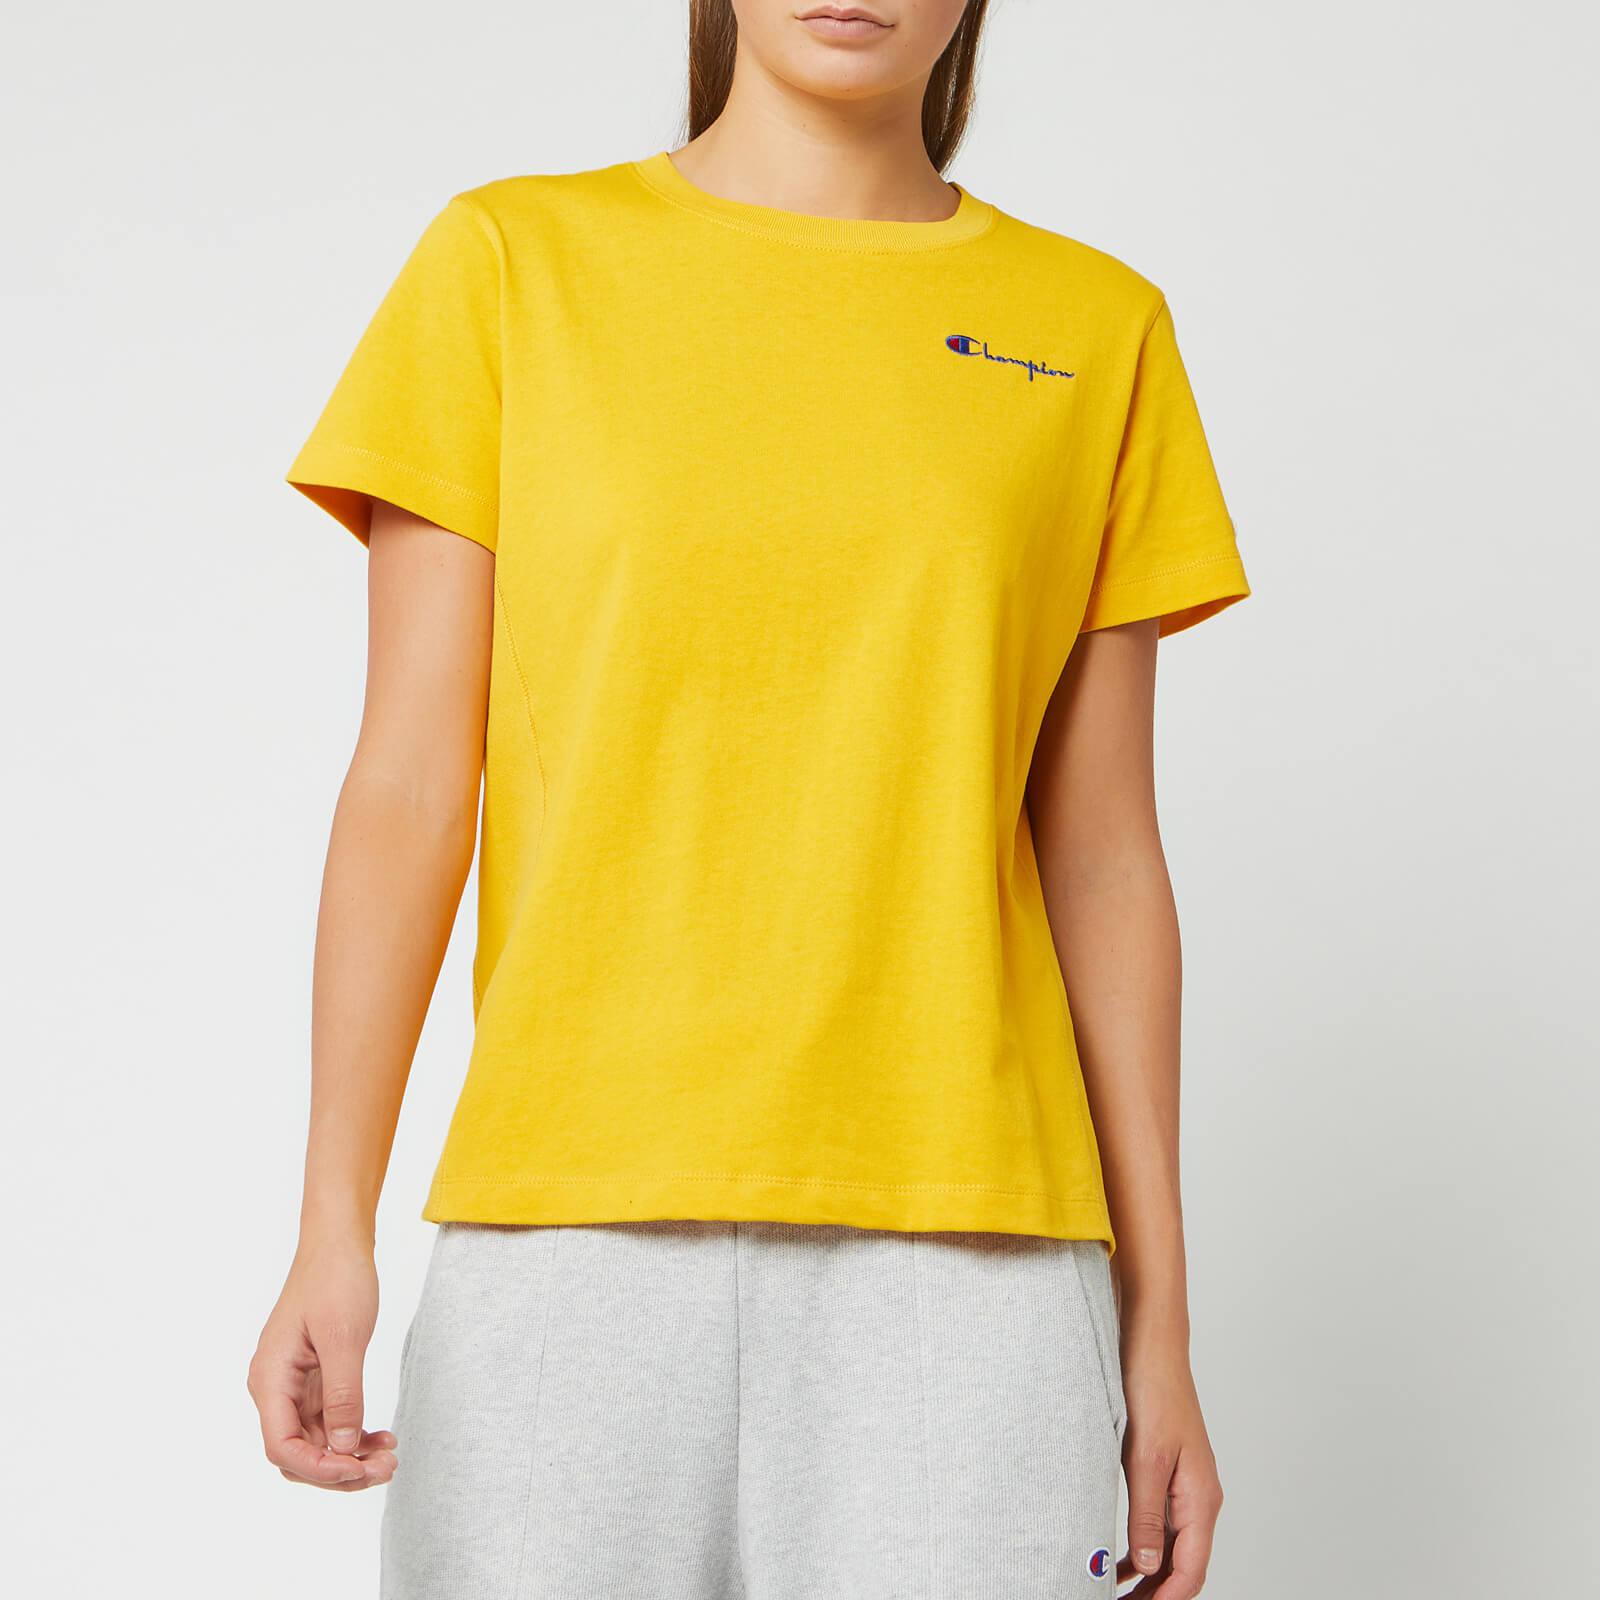 Champion Women's Small Script Crew Neck Short Sleeve T-Shirt - Golden Rod - XS